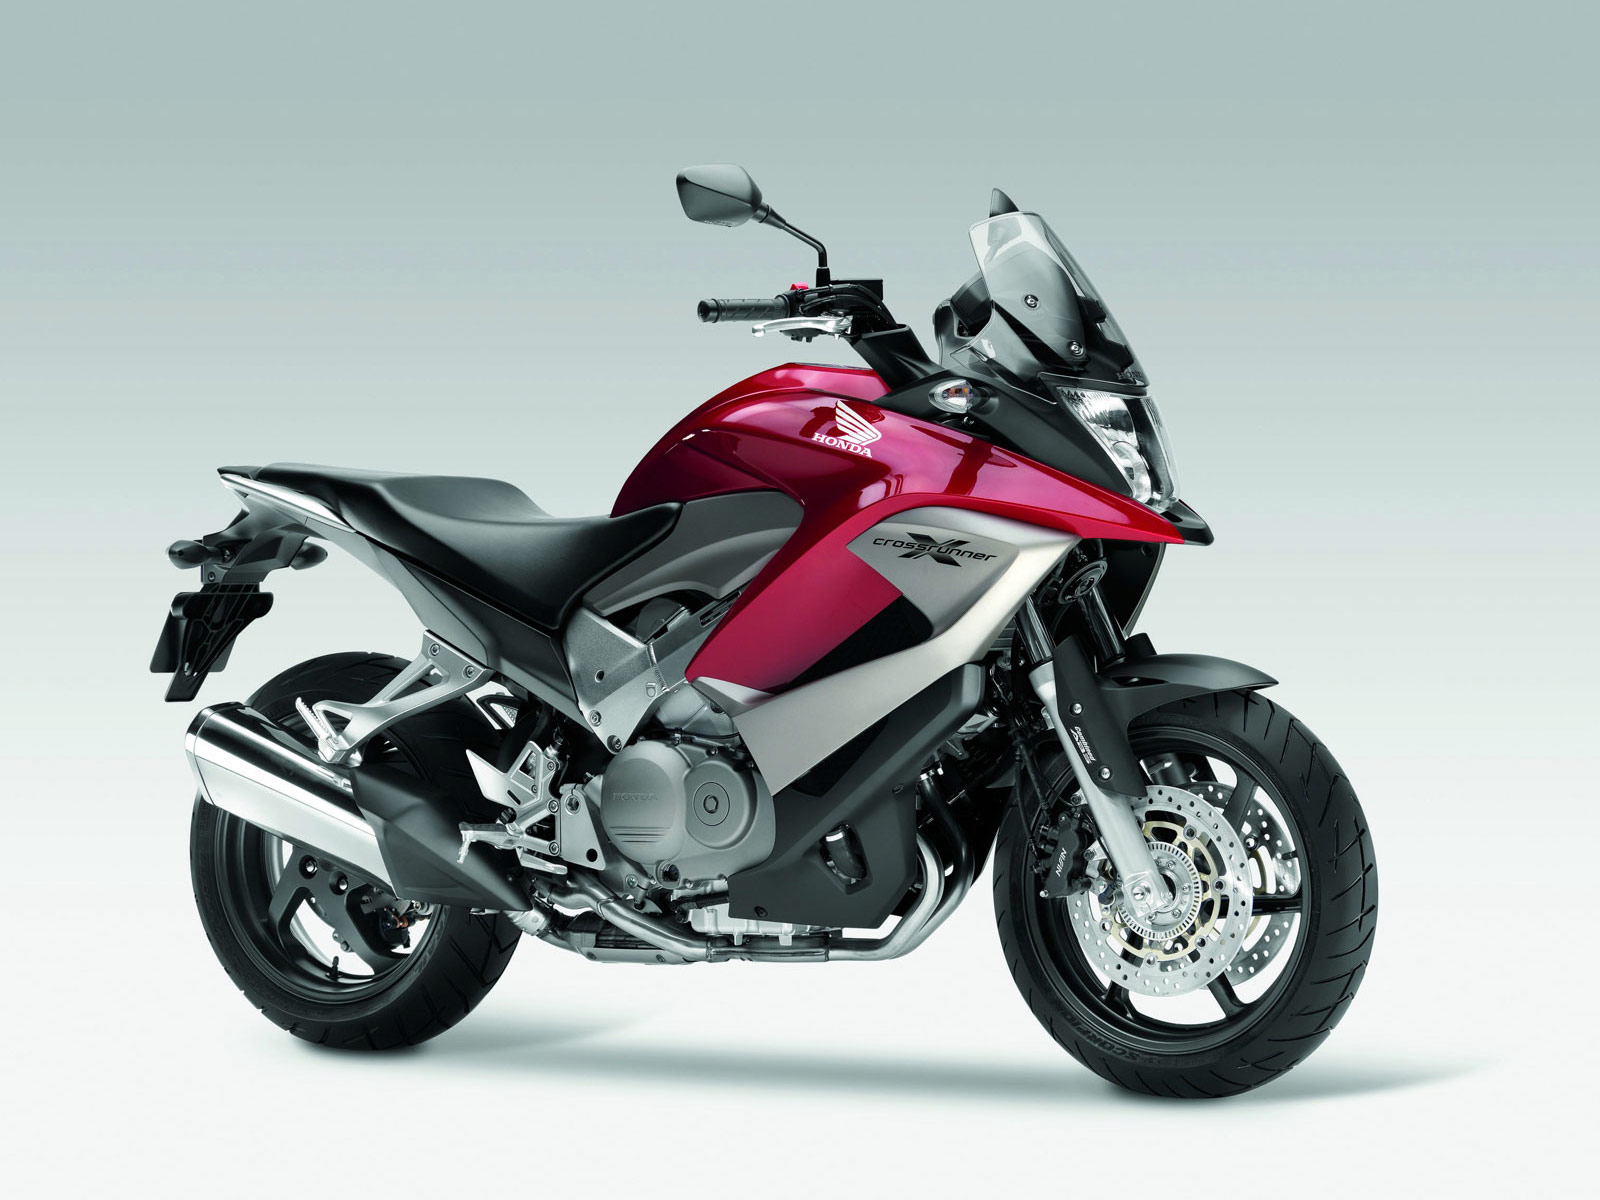 2012 HONDA Crossrunner VFR800X motorcycle wallpapers 1600x1200